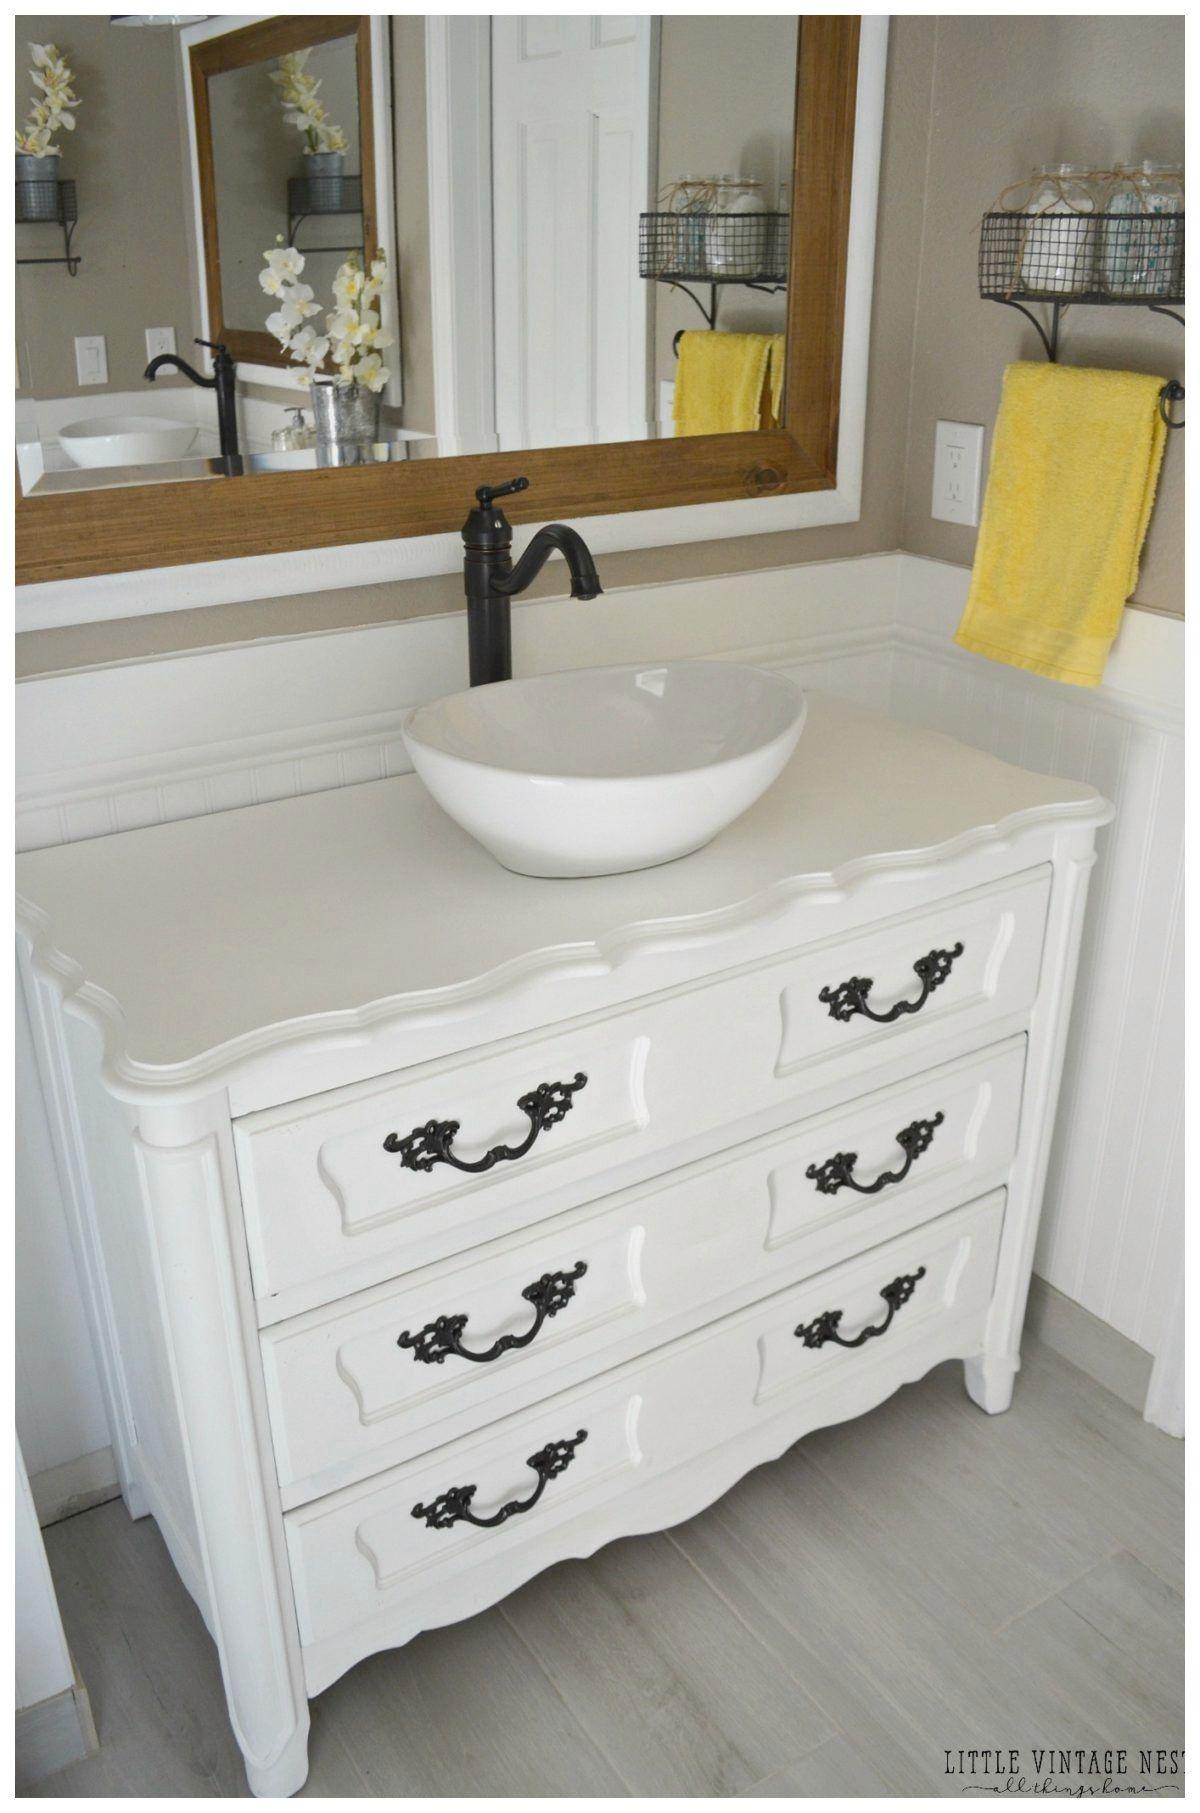 15 Extraordinary Used Bathroom Vanity For Sale Image In 2020 Badezimmer Kommode Shabby Chic Badezimmer Kommode Zum Waschtisch